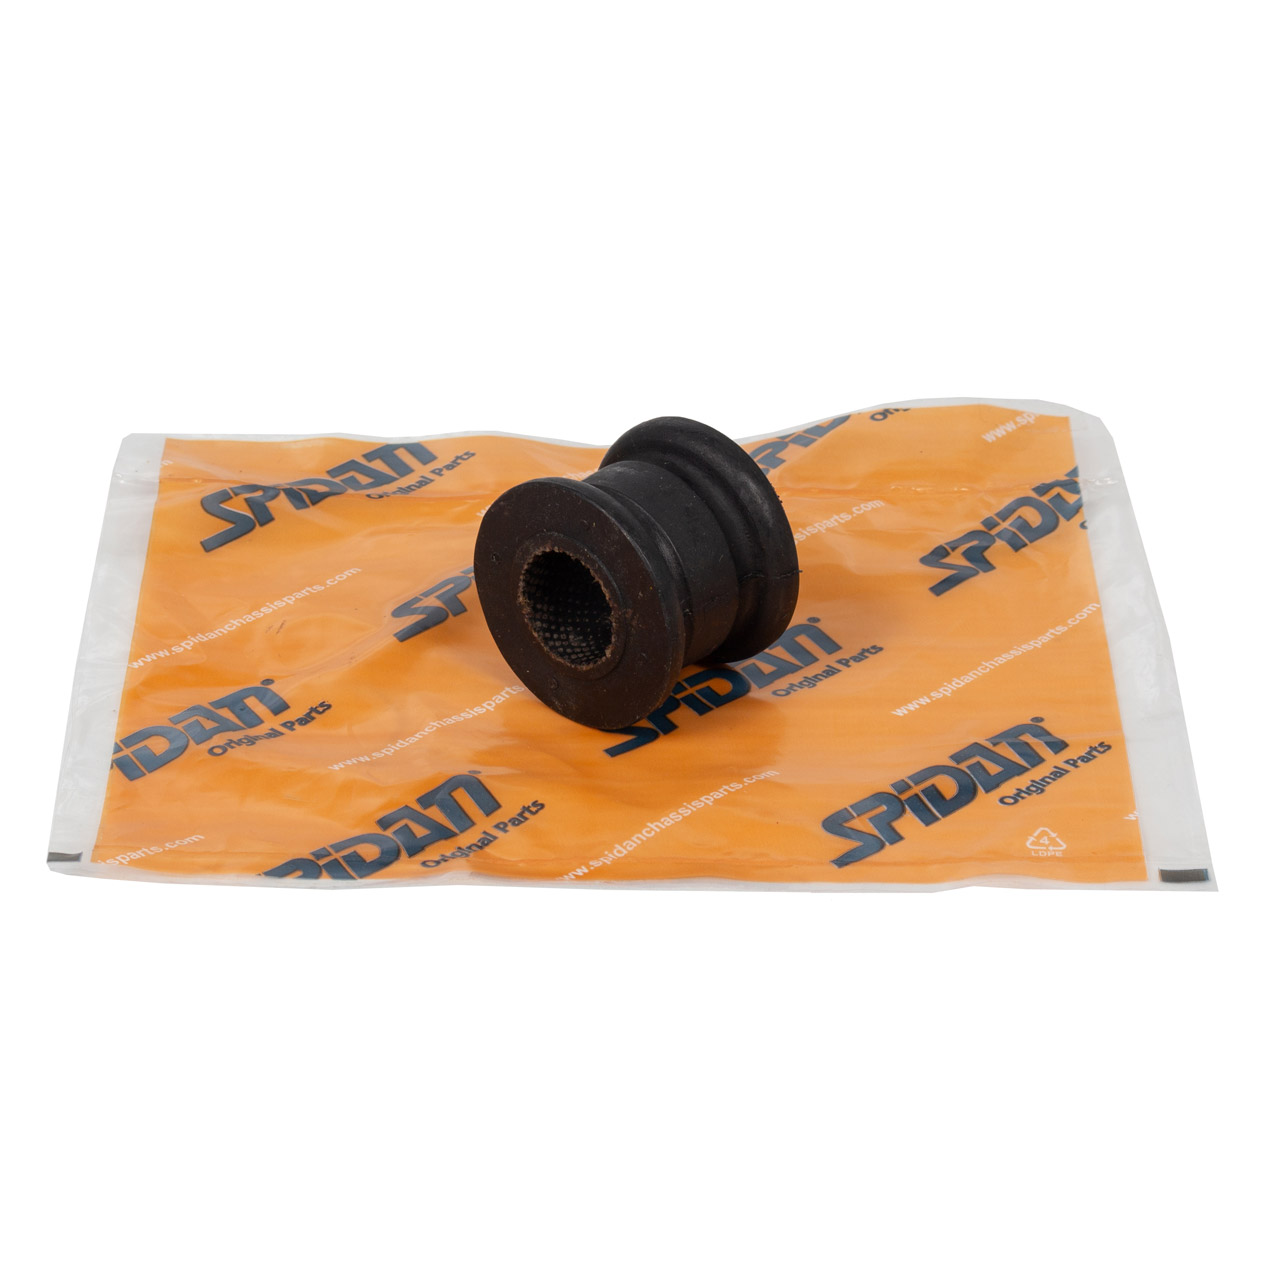 SPIDAN 411440 Stabilisatorlager MERCEDES 190 W201 E 1.8-2.6 D 2.0-2.5 vorne 2013234885